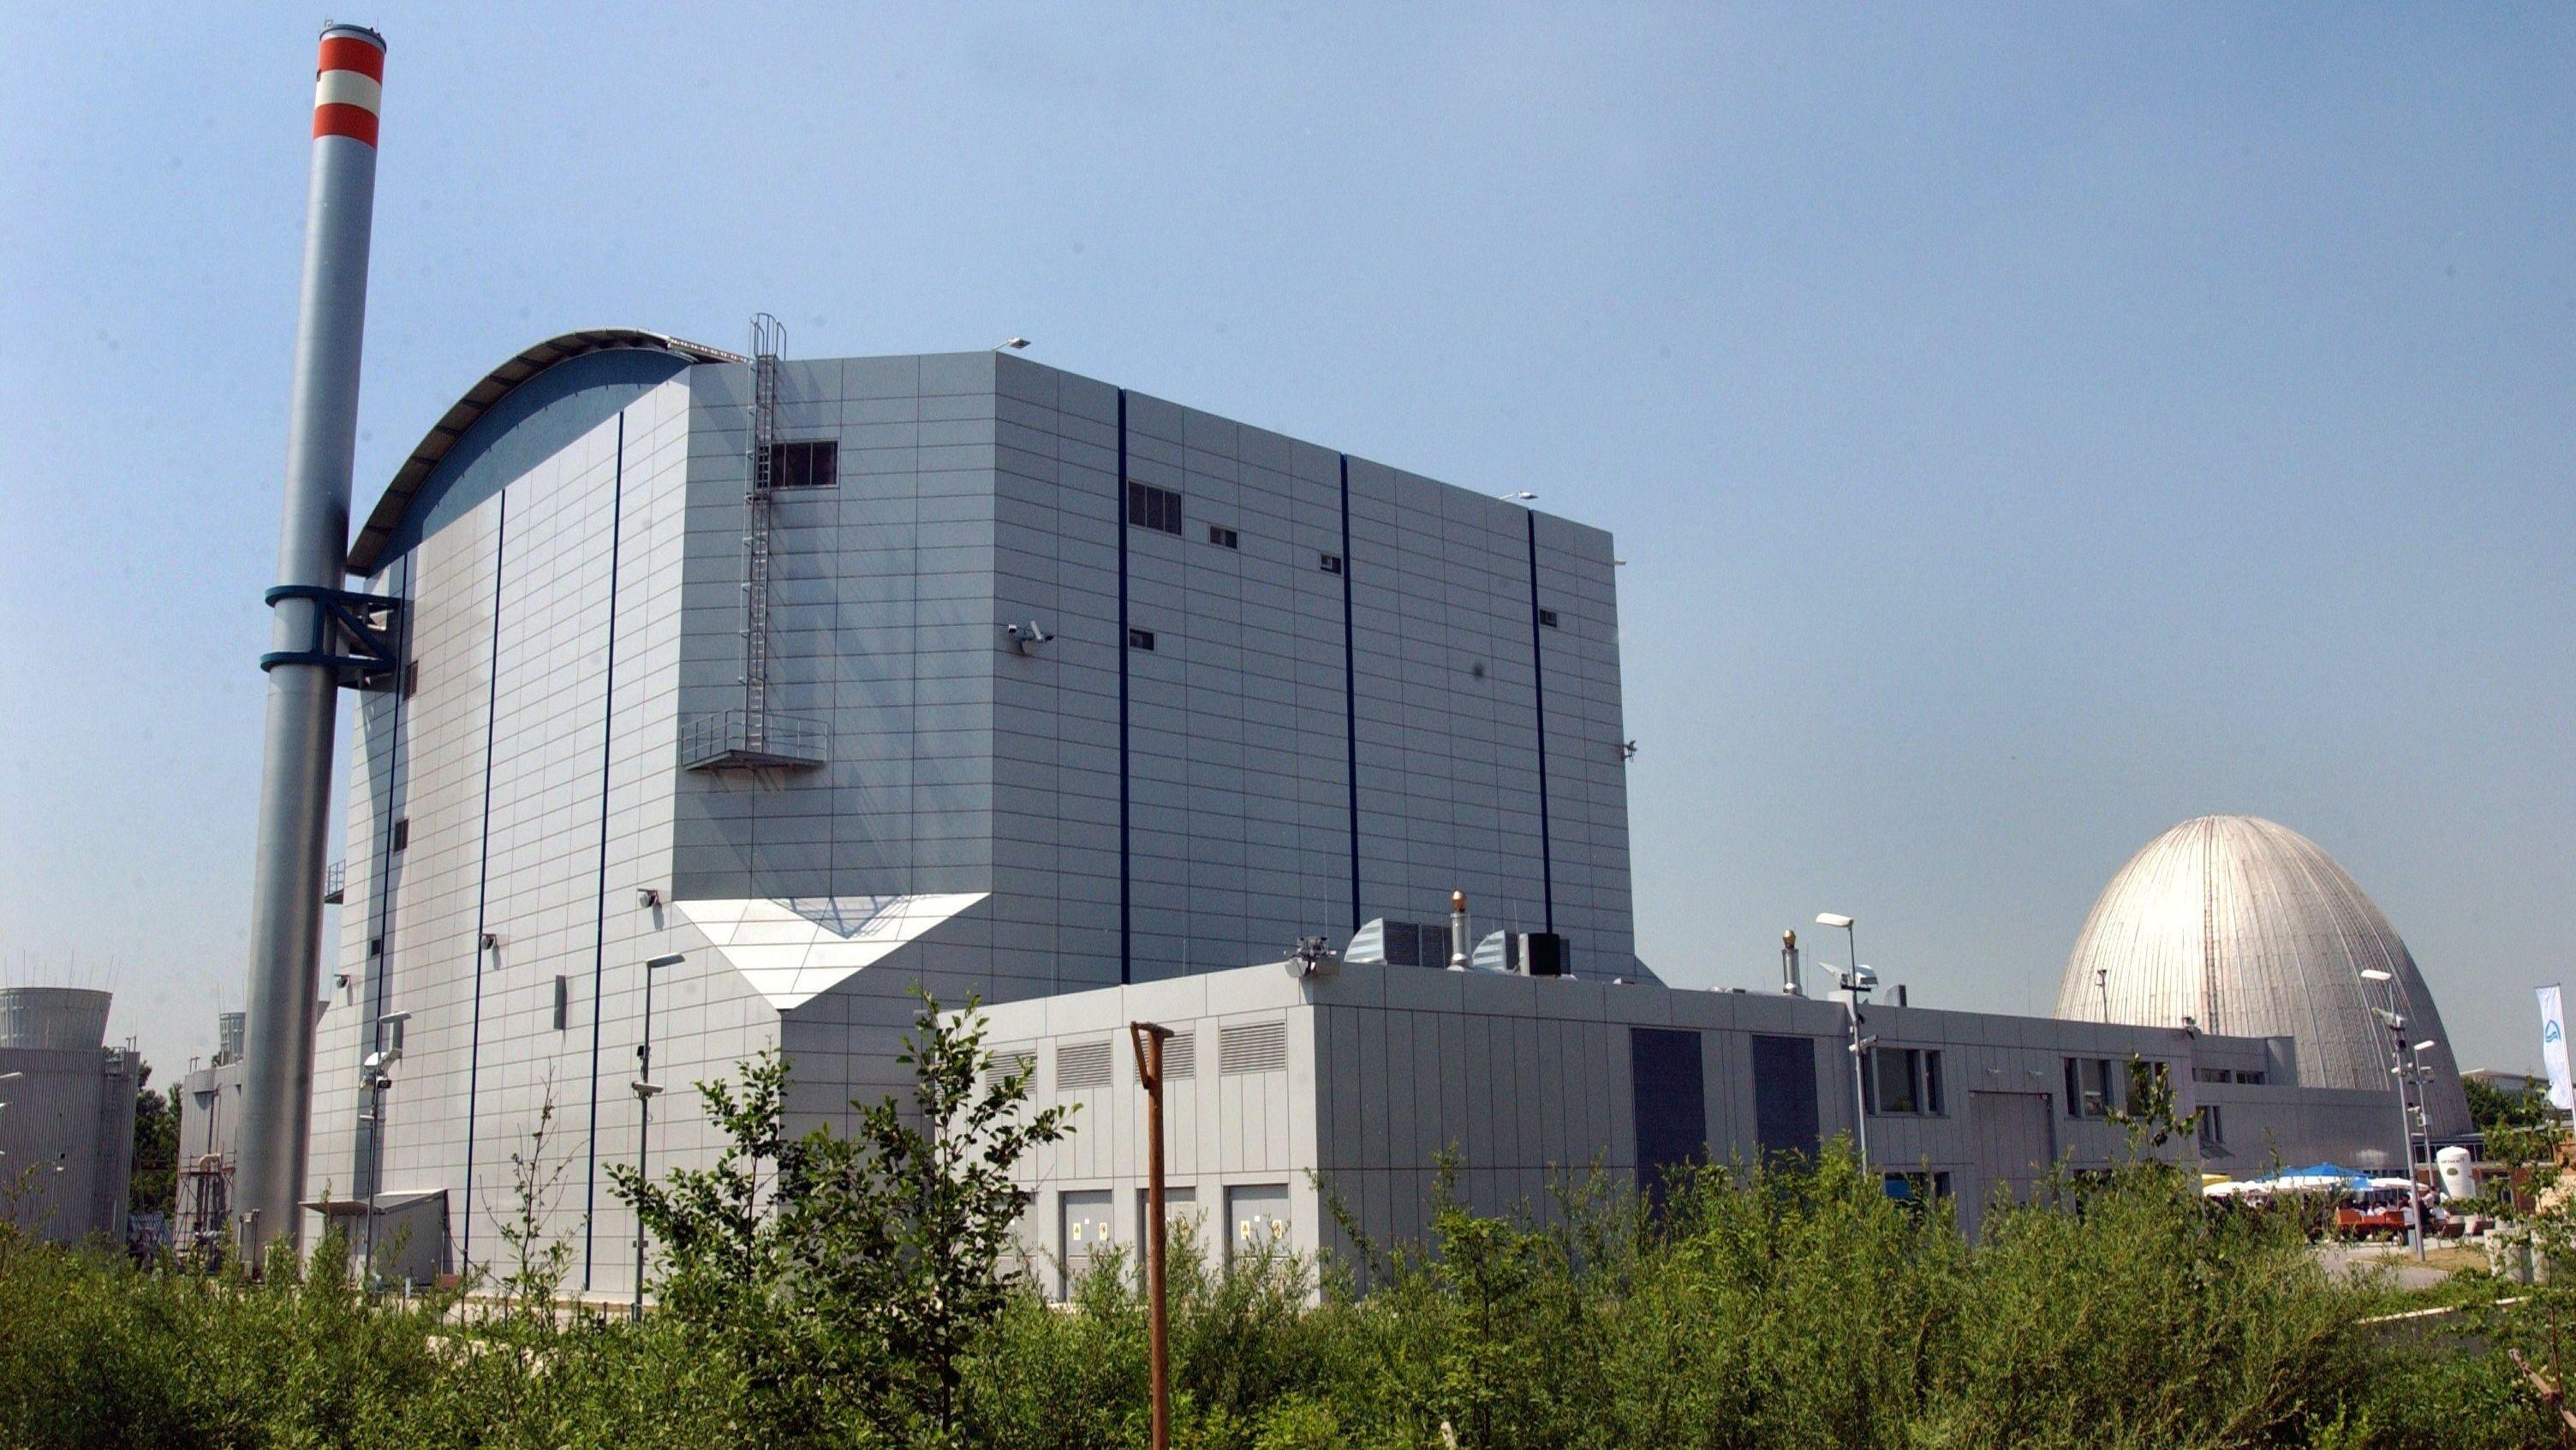 Der Forschungsreaktor FRM II in Garching, im Hintergrund der Vorgänger FRM I.